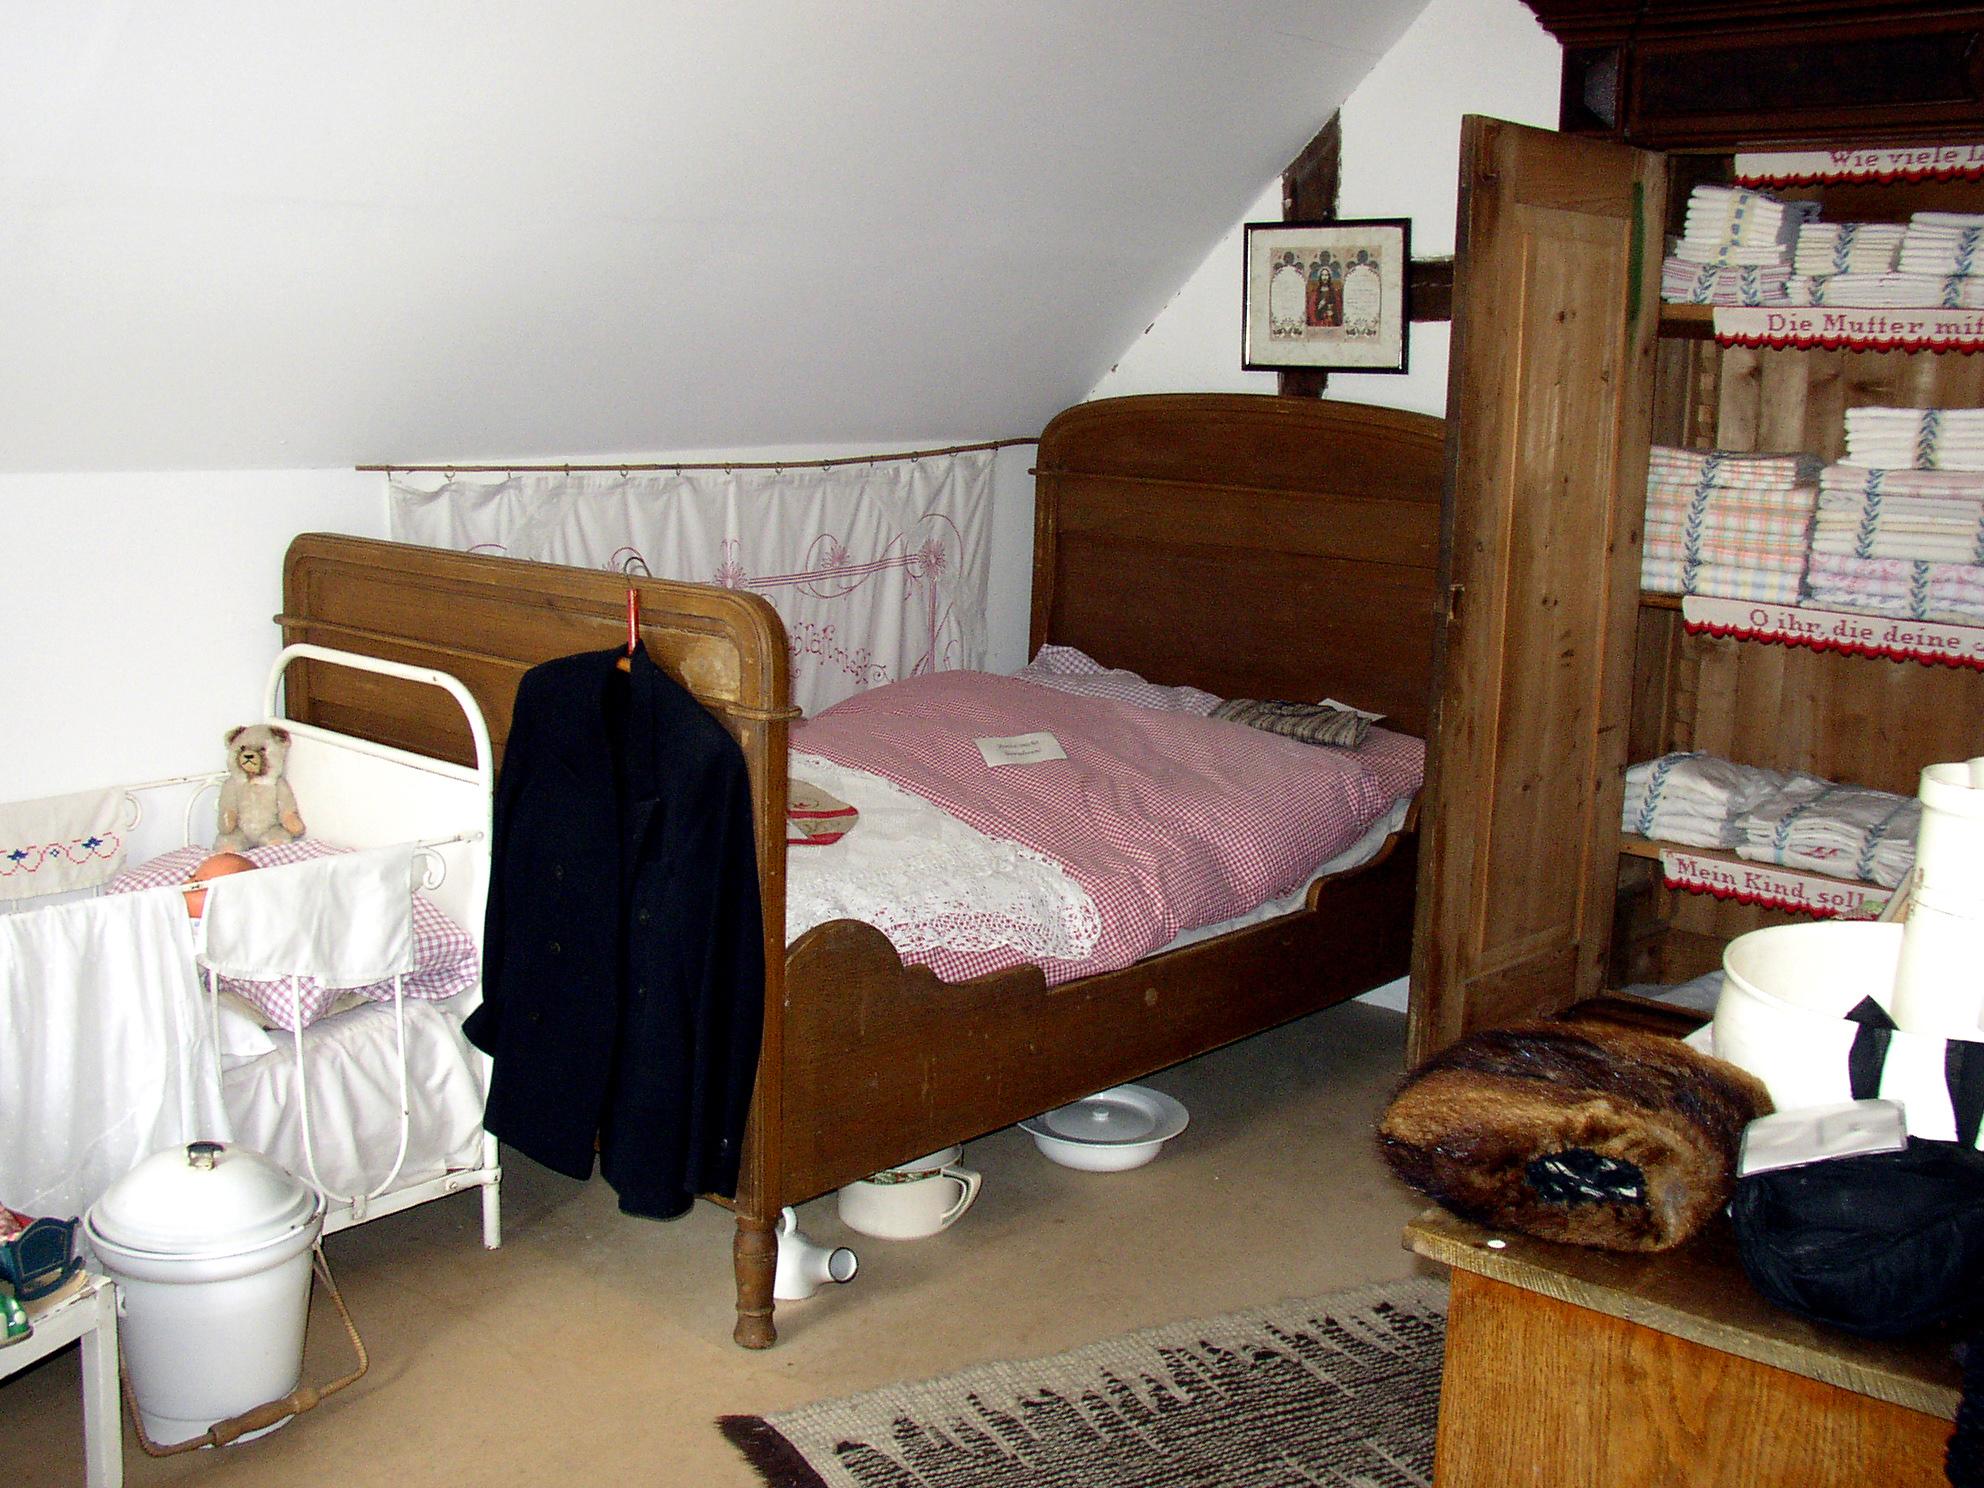 Schlafstube des Heimatmuseums Müden/Aller